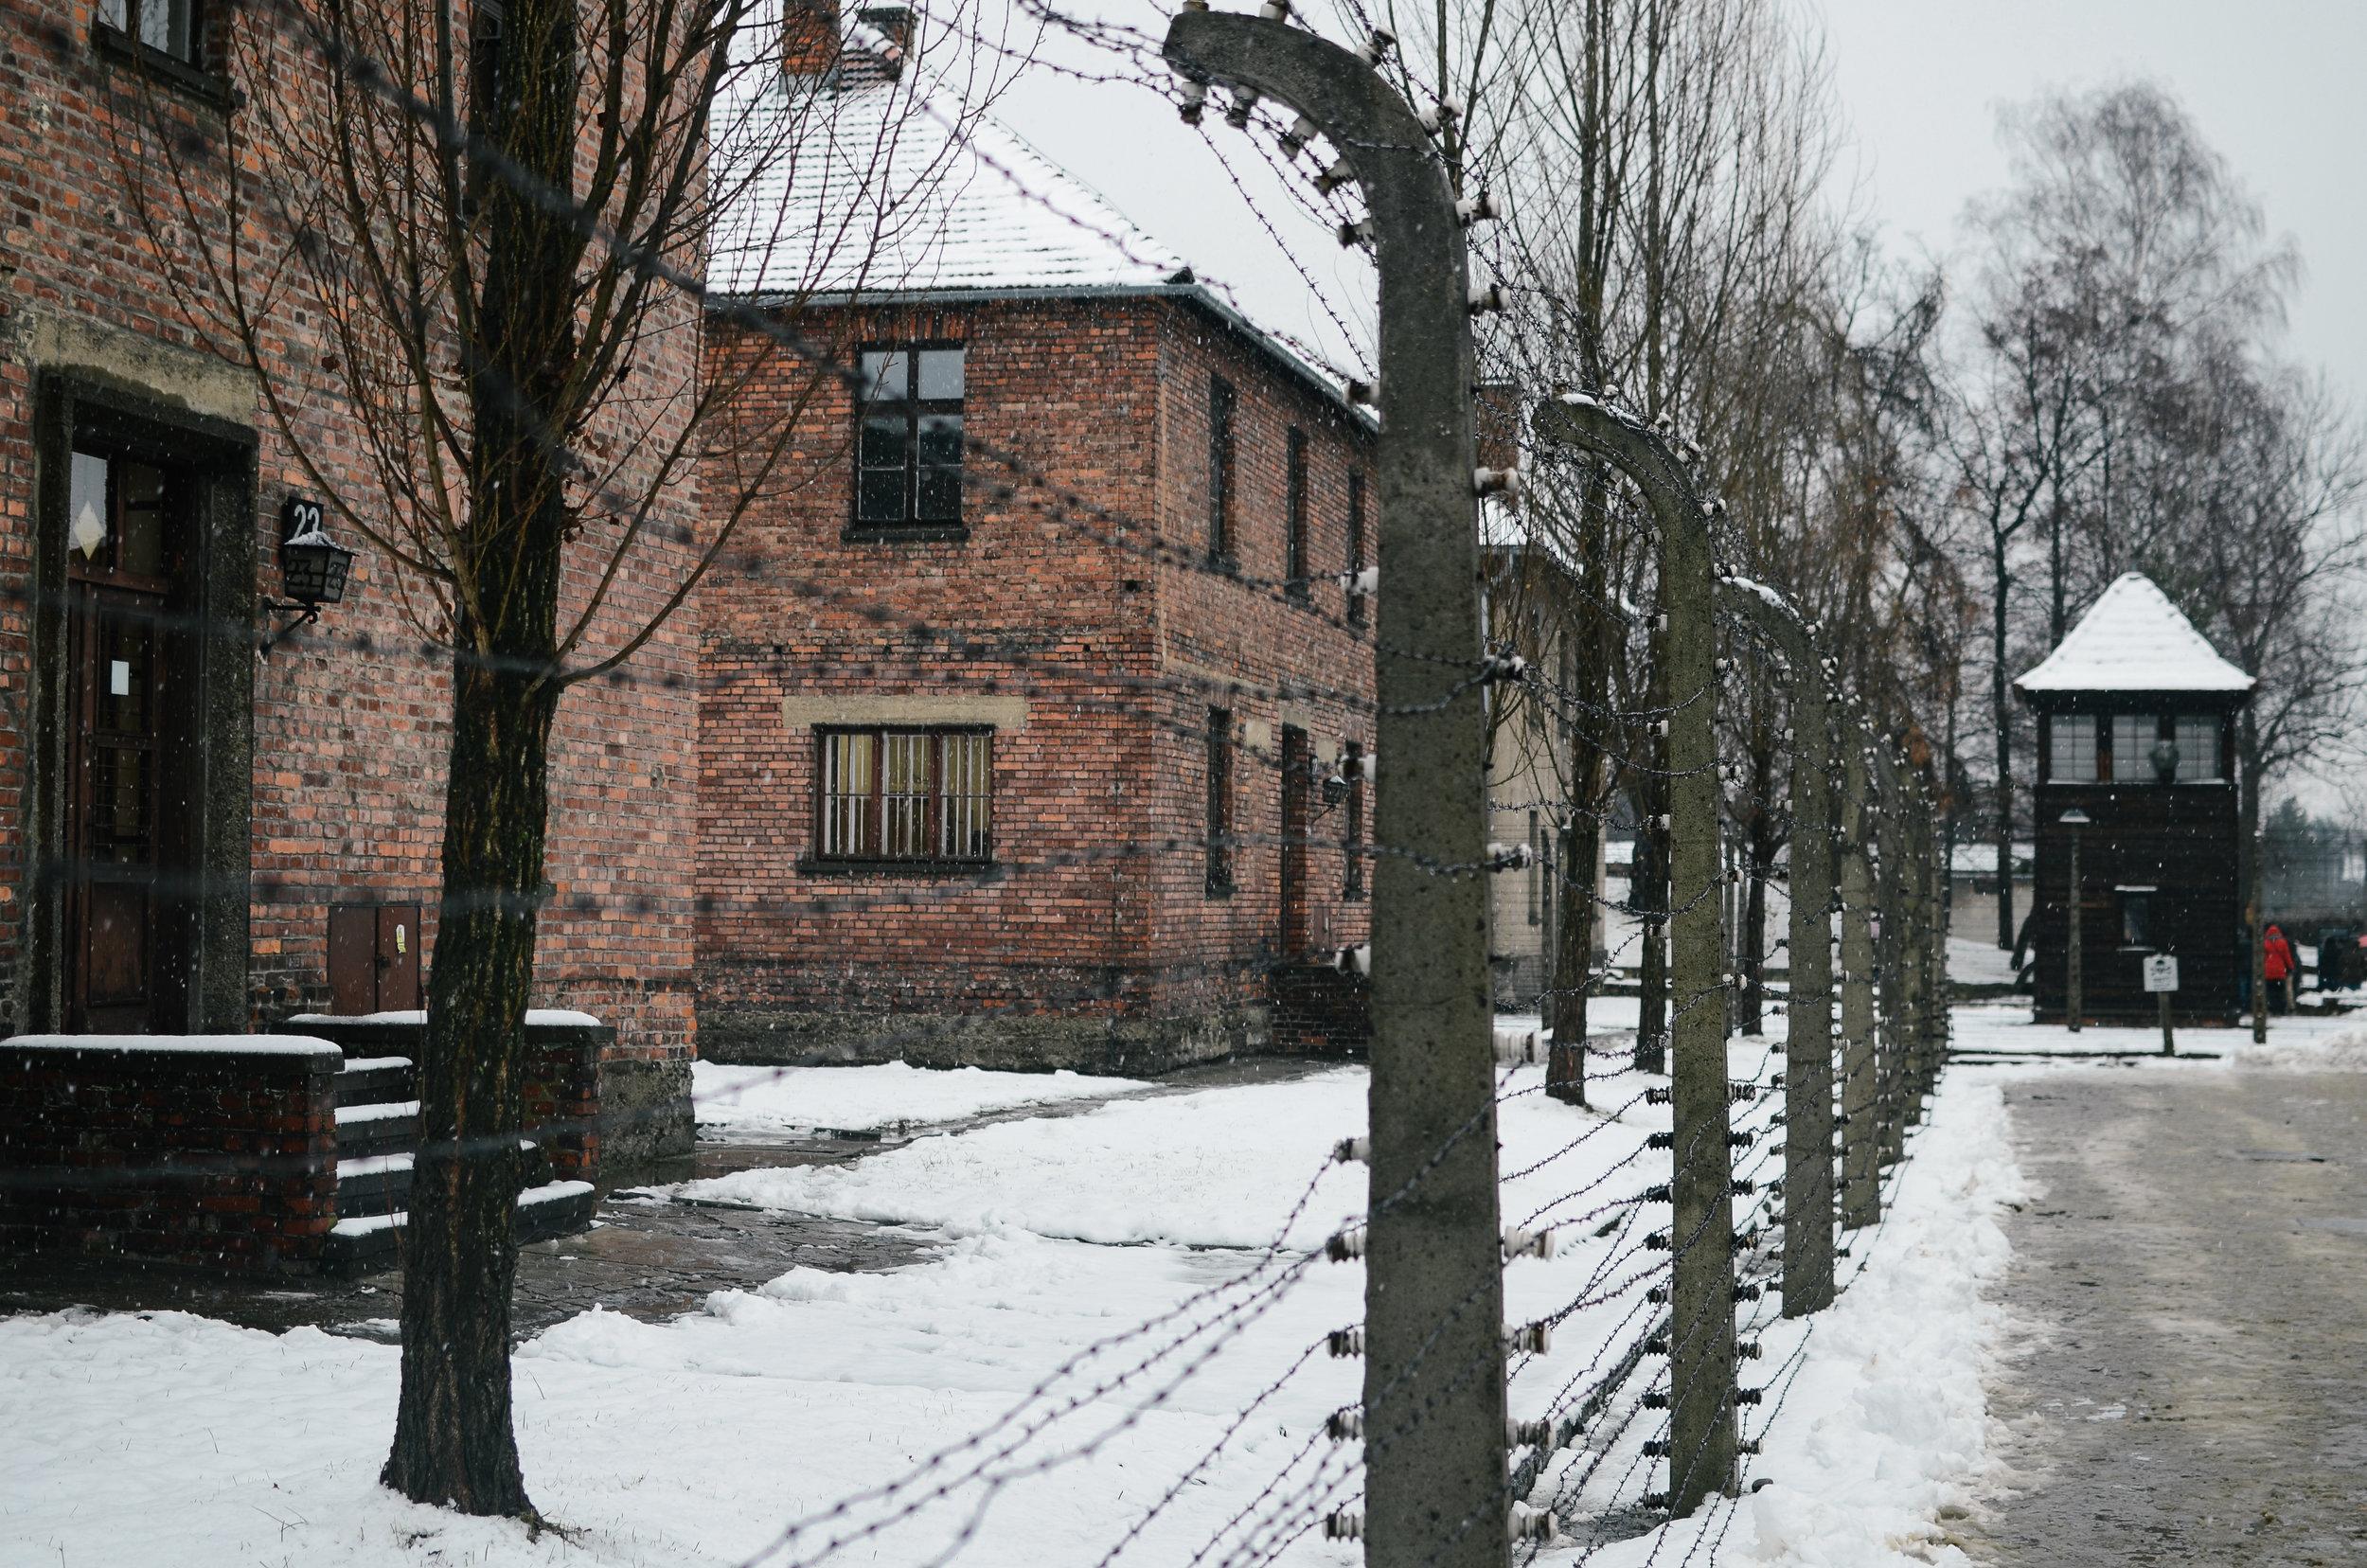 aushwitz-krakow-poland-travel-guide-lifeonpin_DSC_1026.jpg